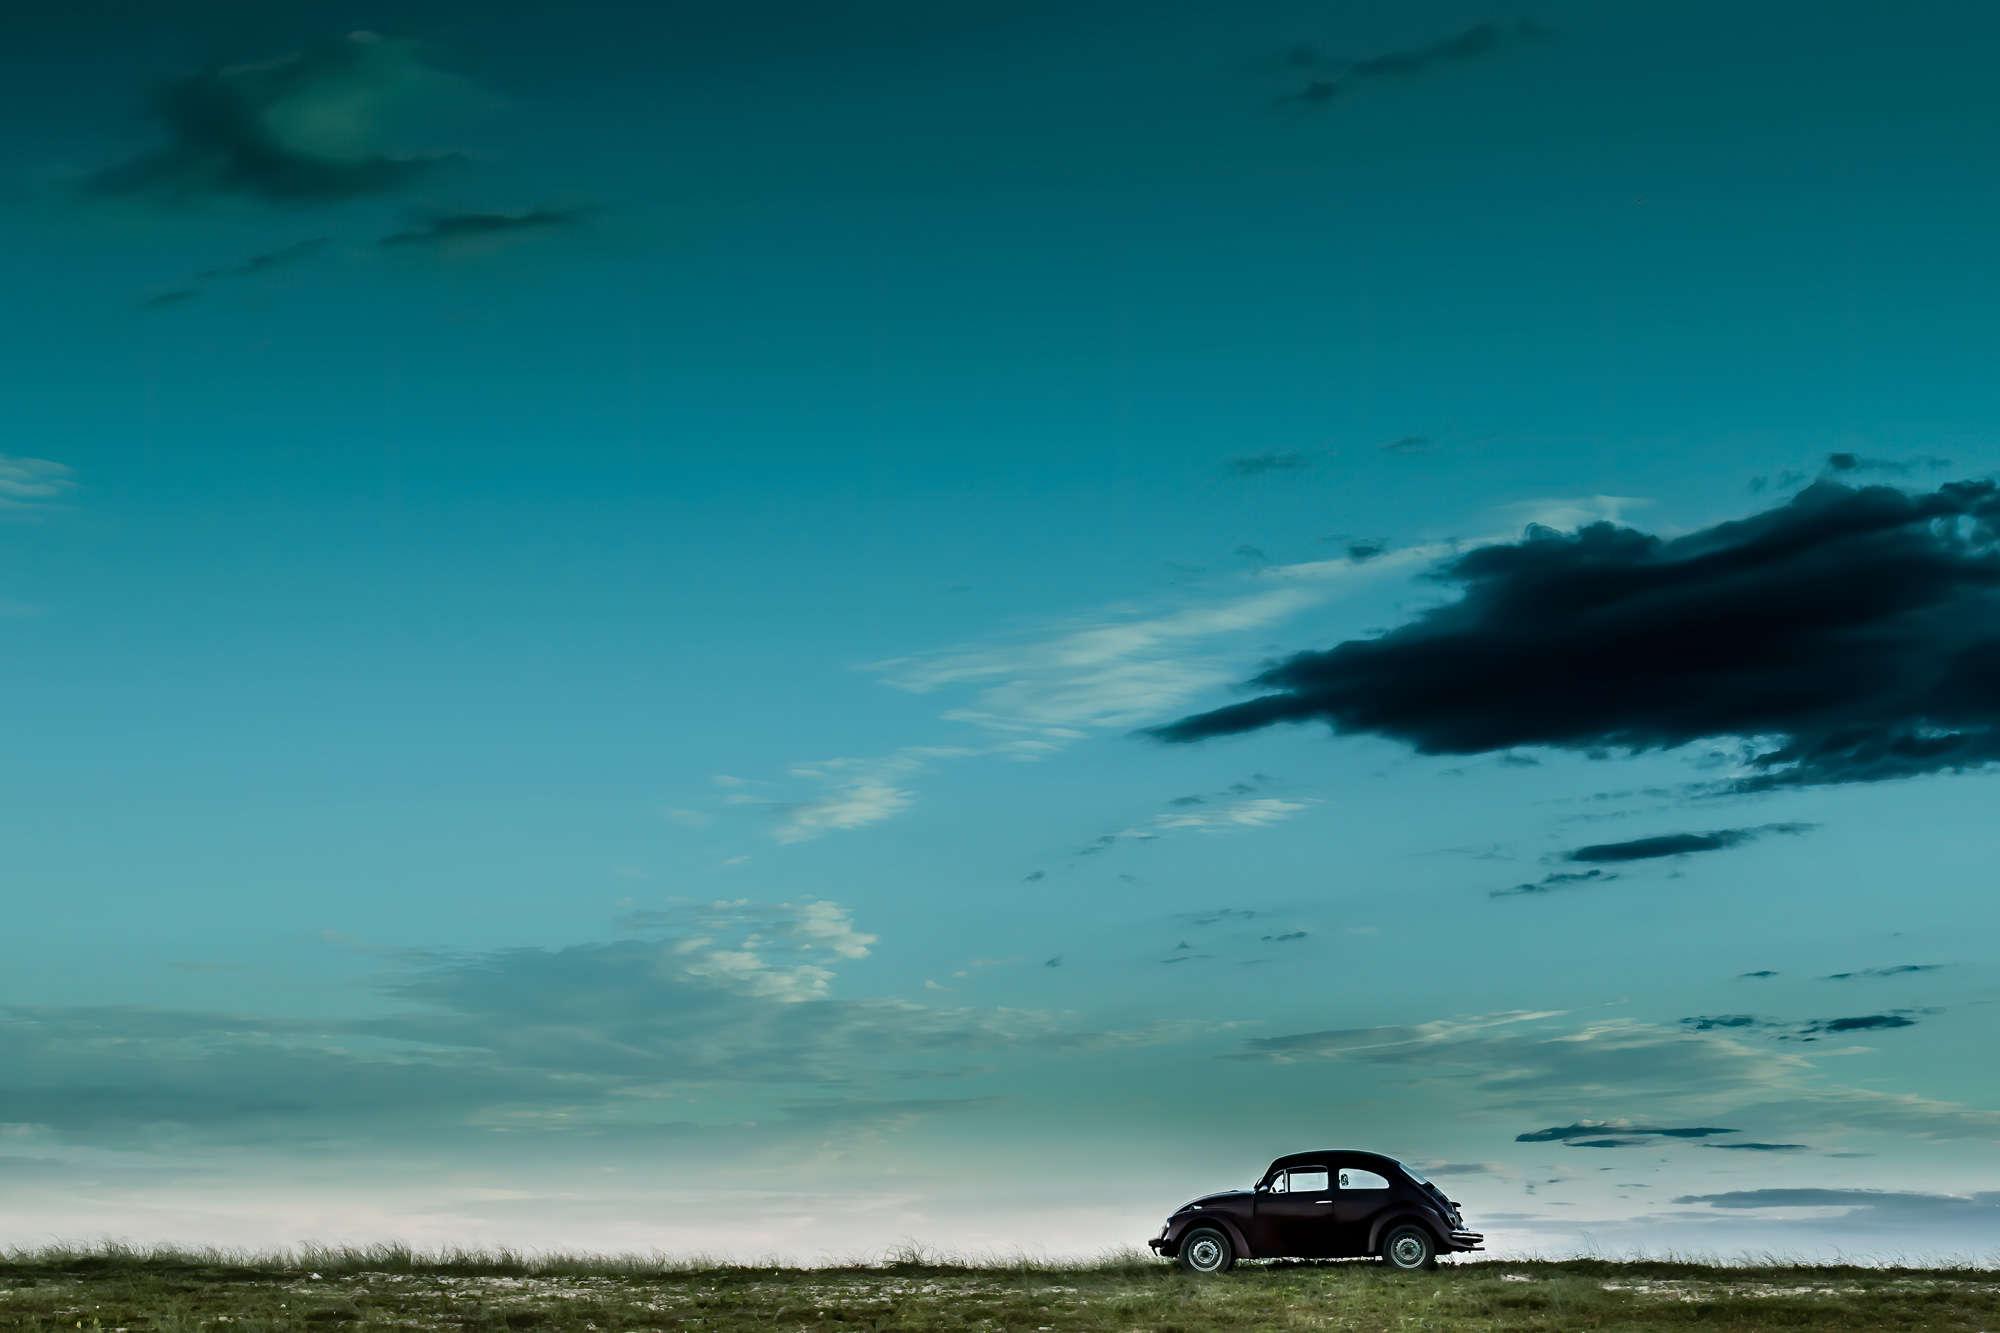 Camilo Otero - A Road Less Travelled